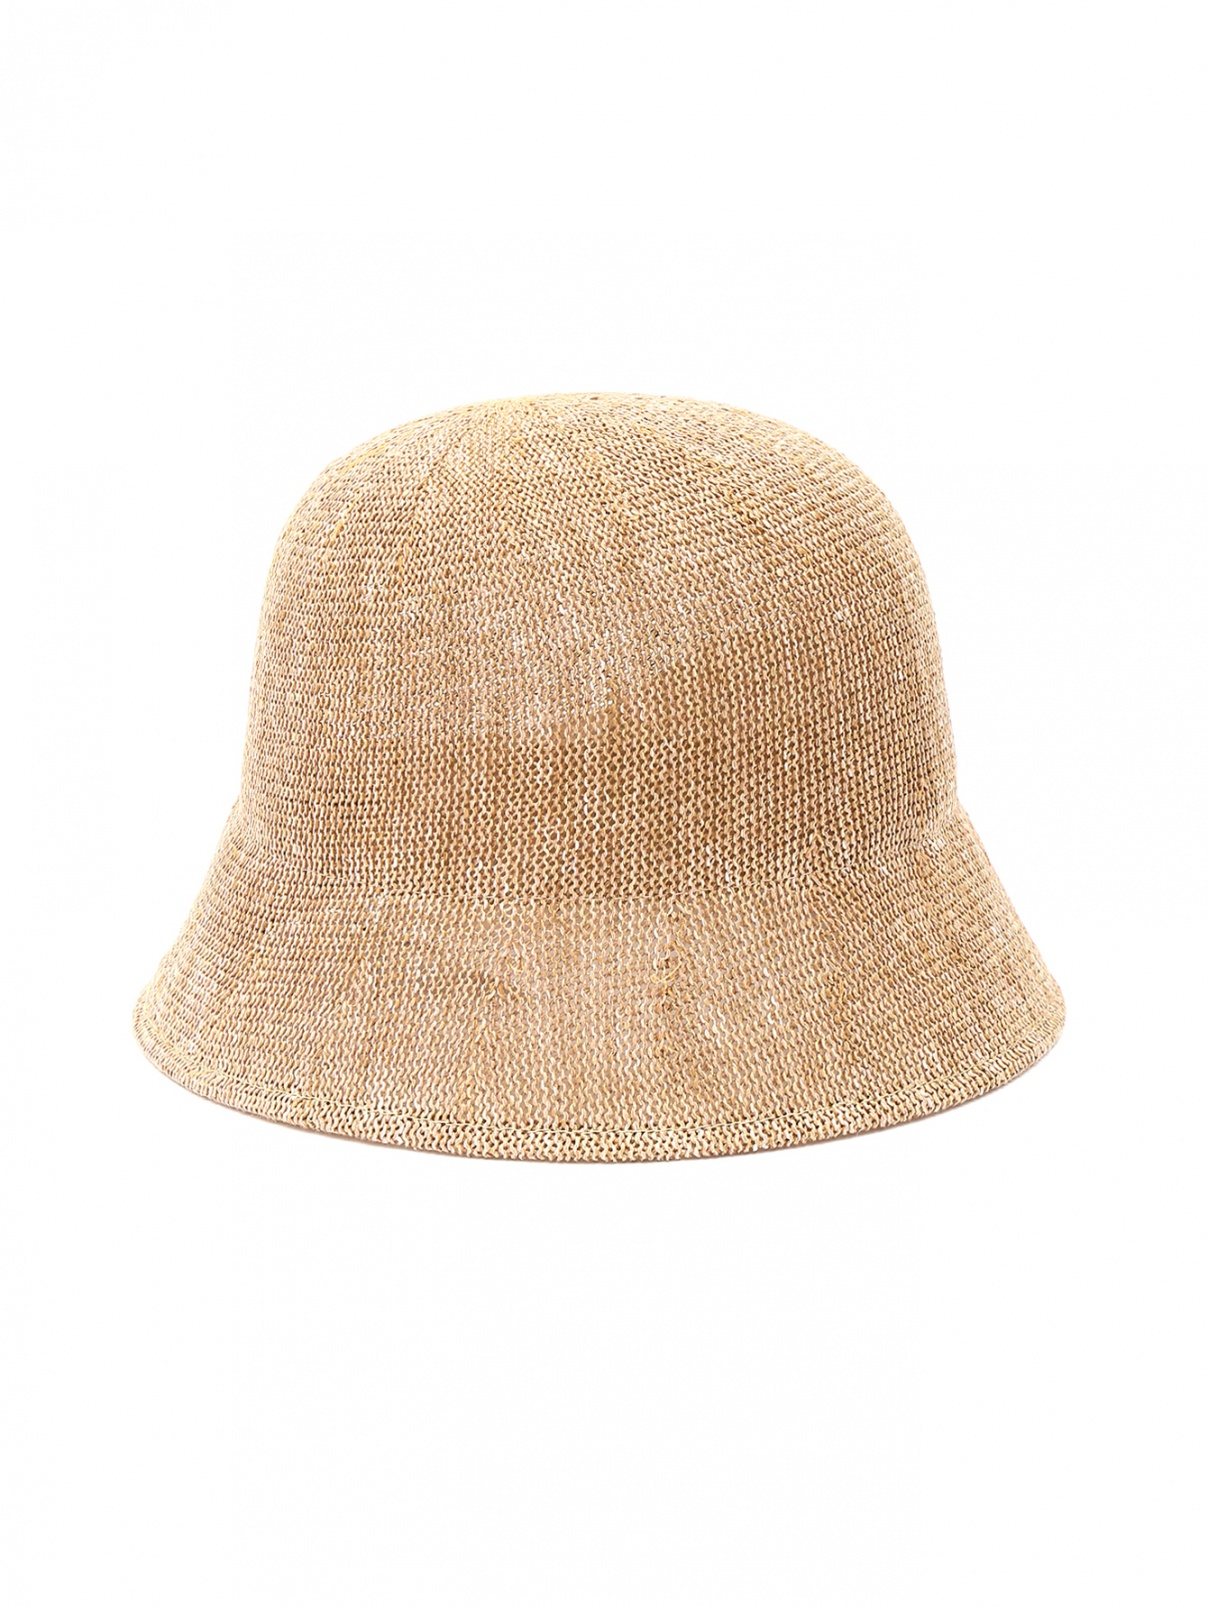 Шляпа с узкими полями Weekend Max Mara  –  Общий вид